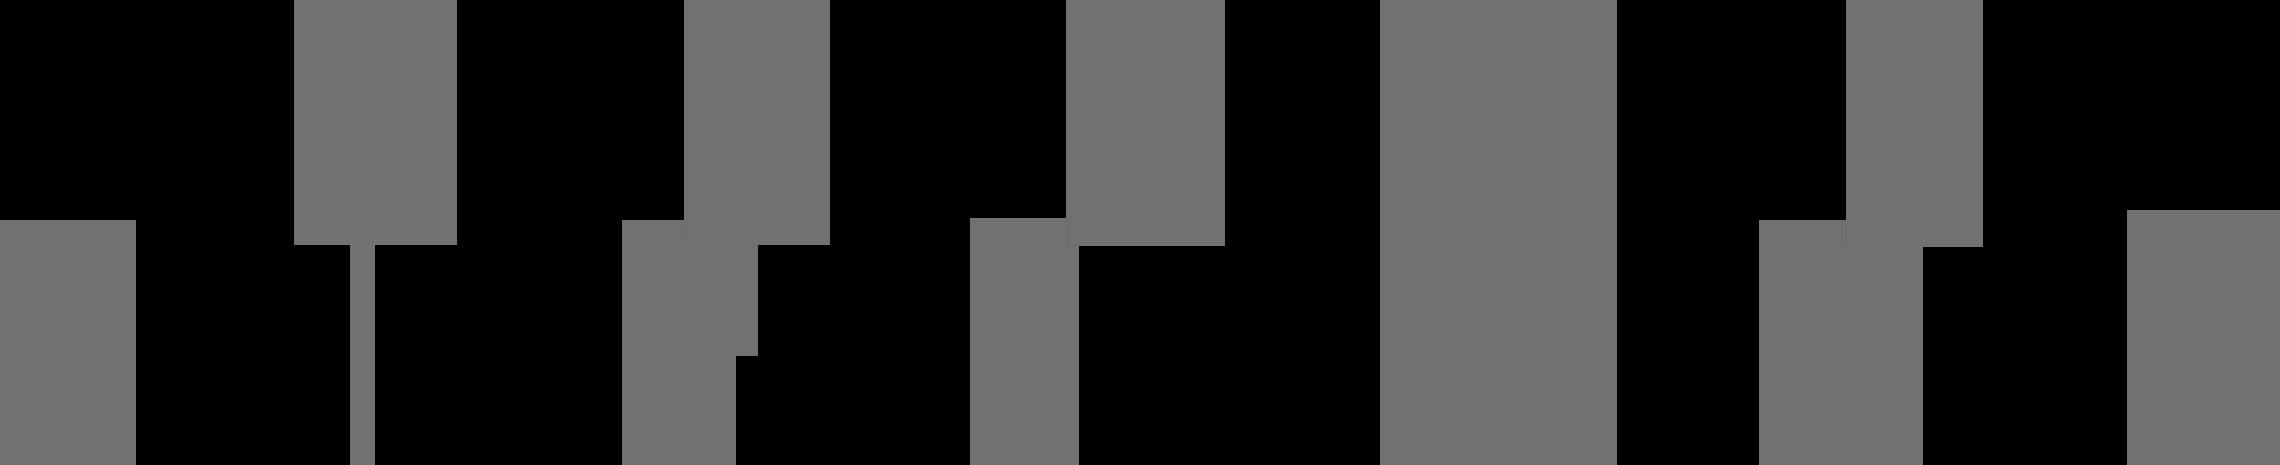 REBEL LIFTERS logo_grey.png